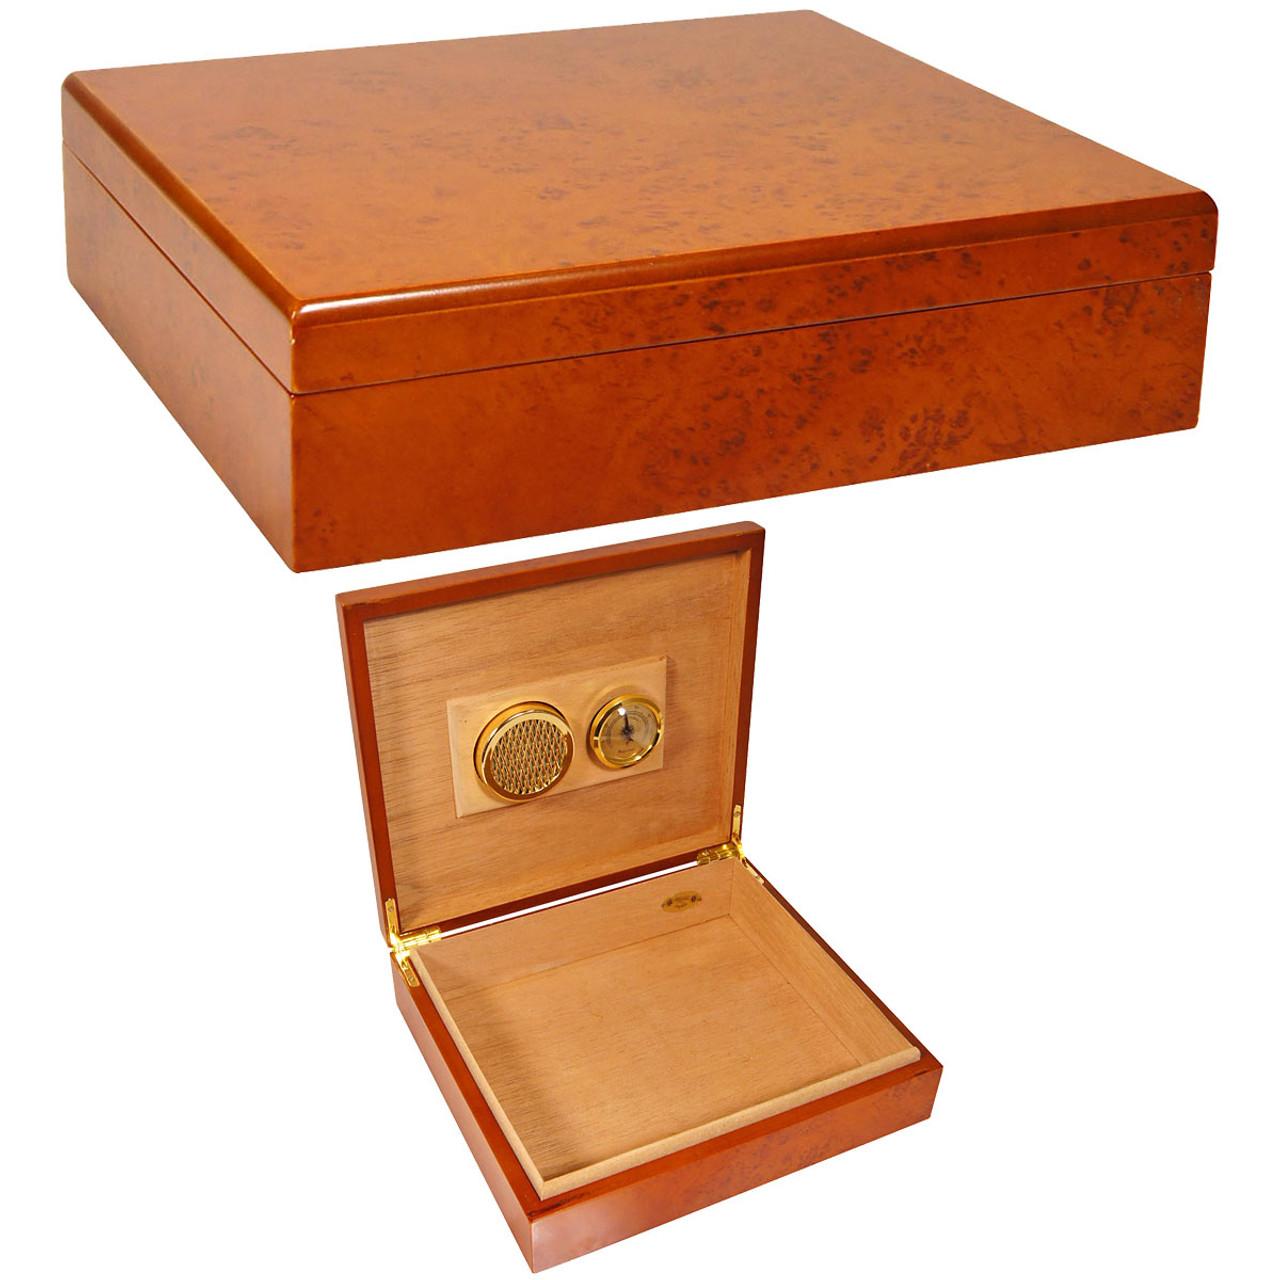 No Cigars Included Hi-Gloss Set of 2 Camacho Connecticut Empty Cigar Boxes